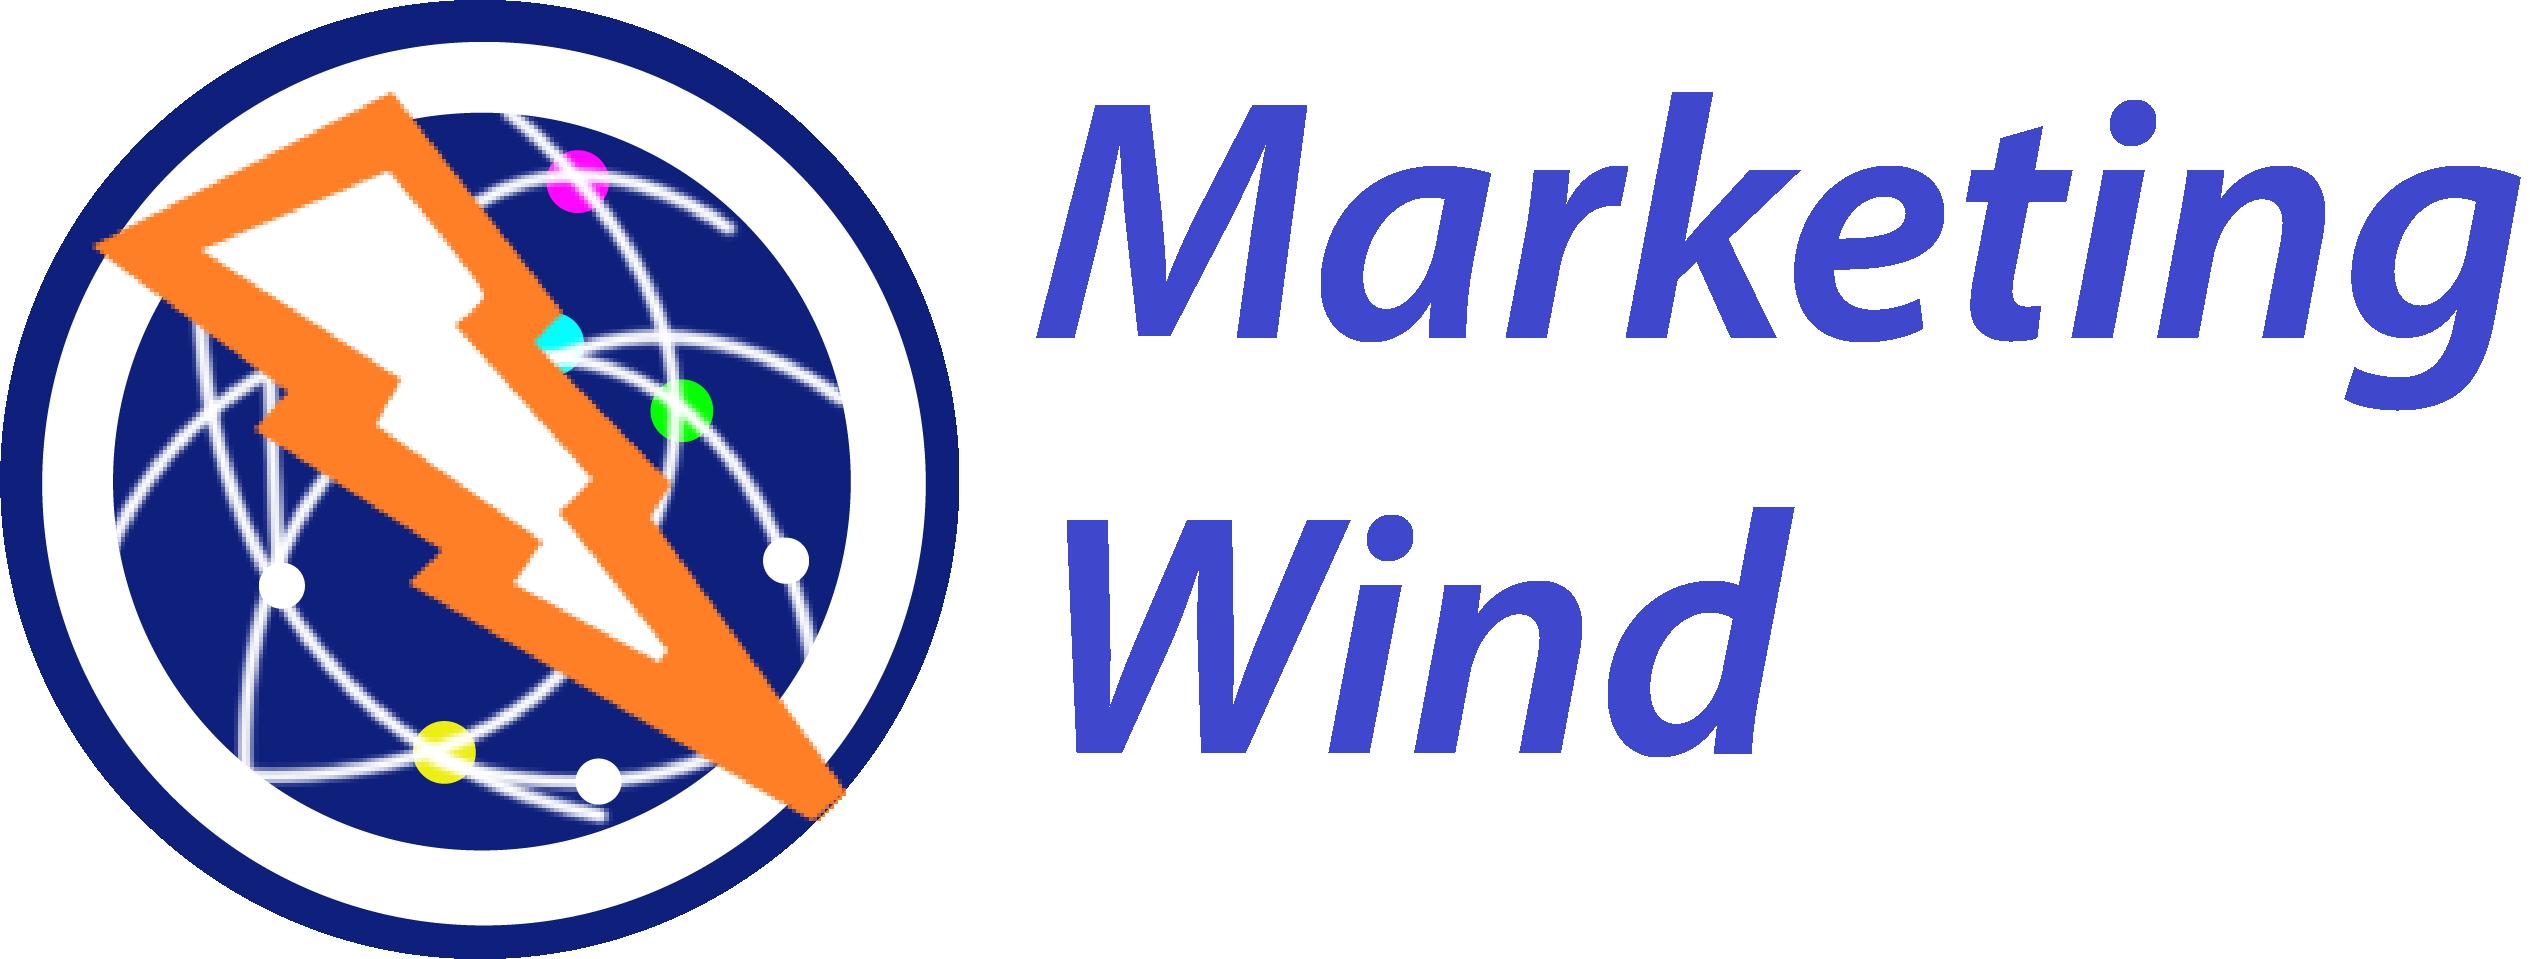 Marketing Wind